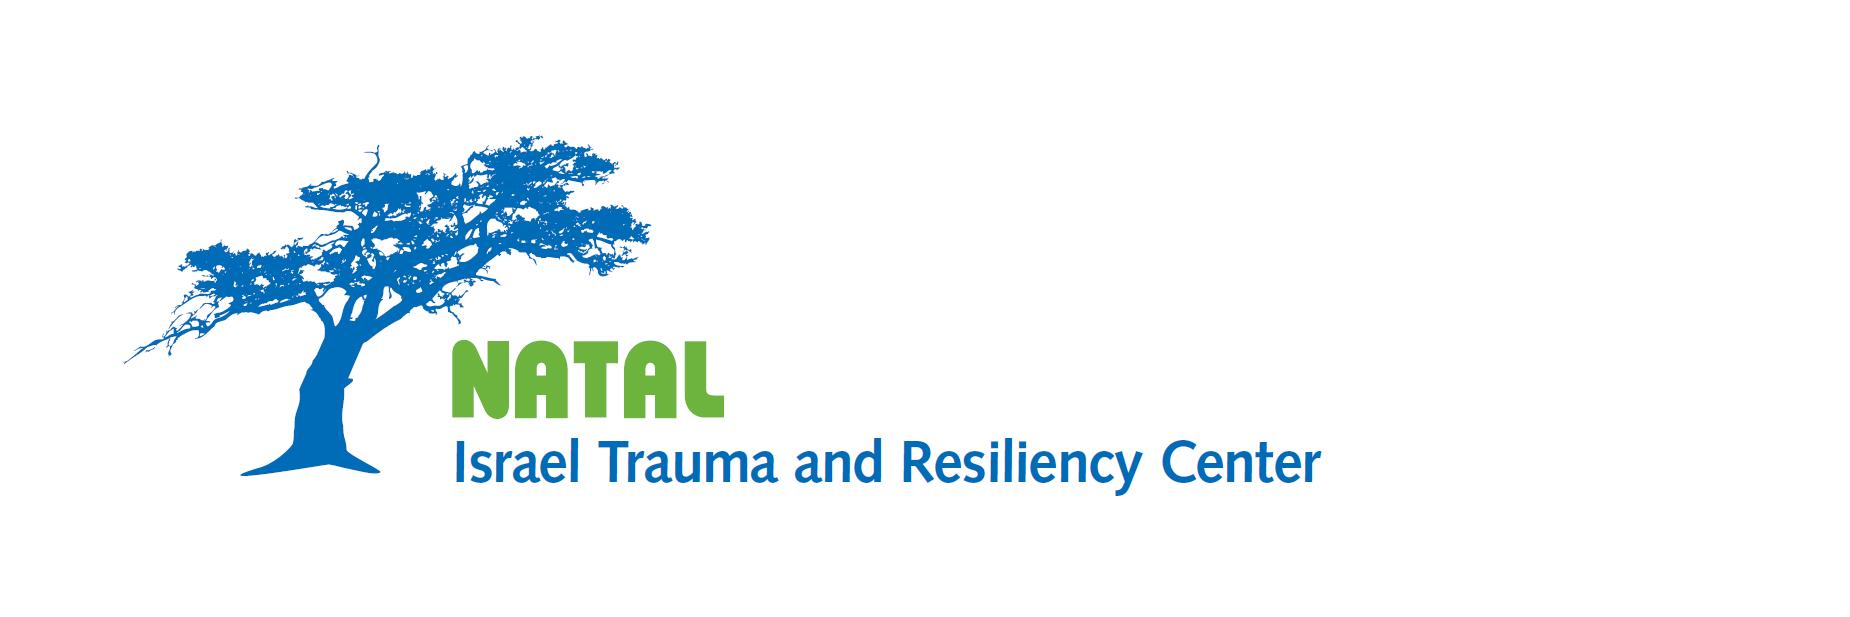 Natal - Israeli Trauma Resiliency Center